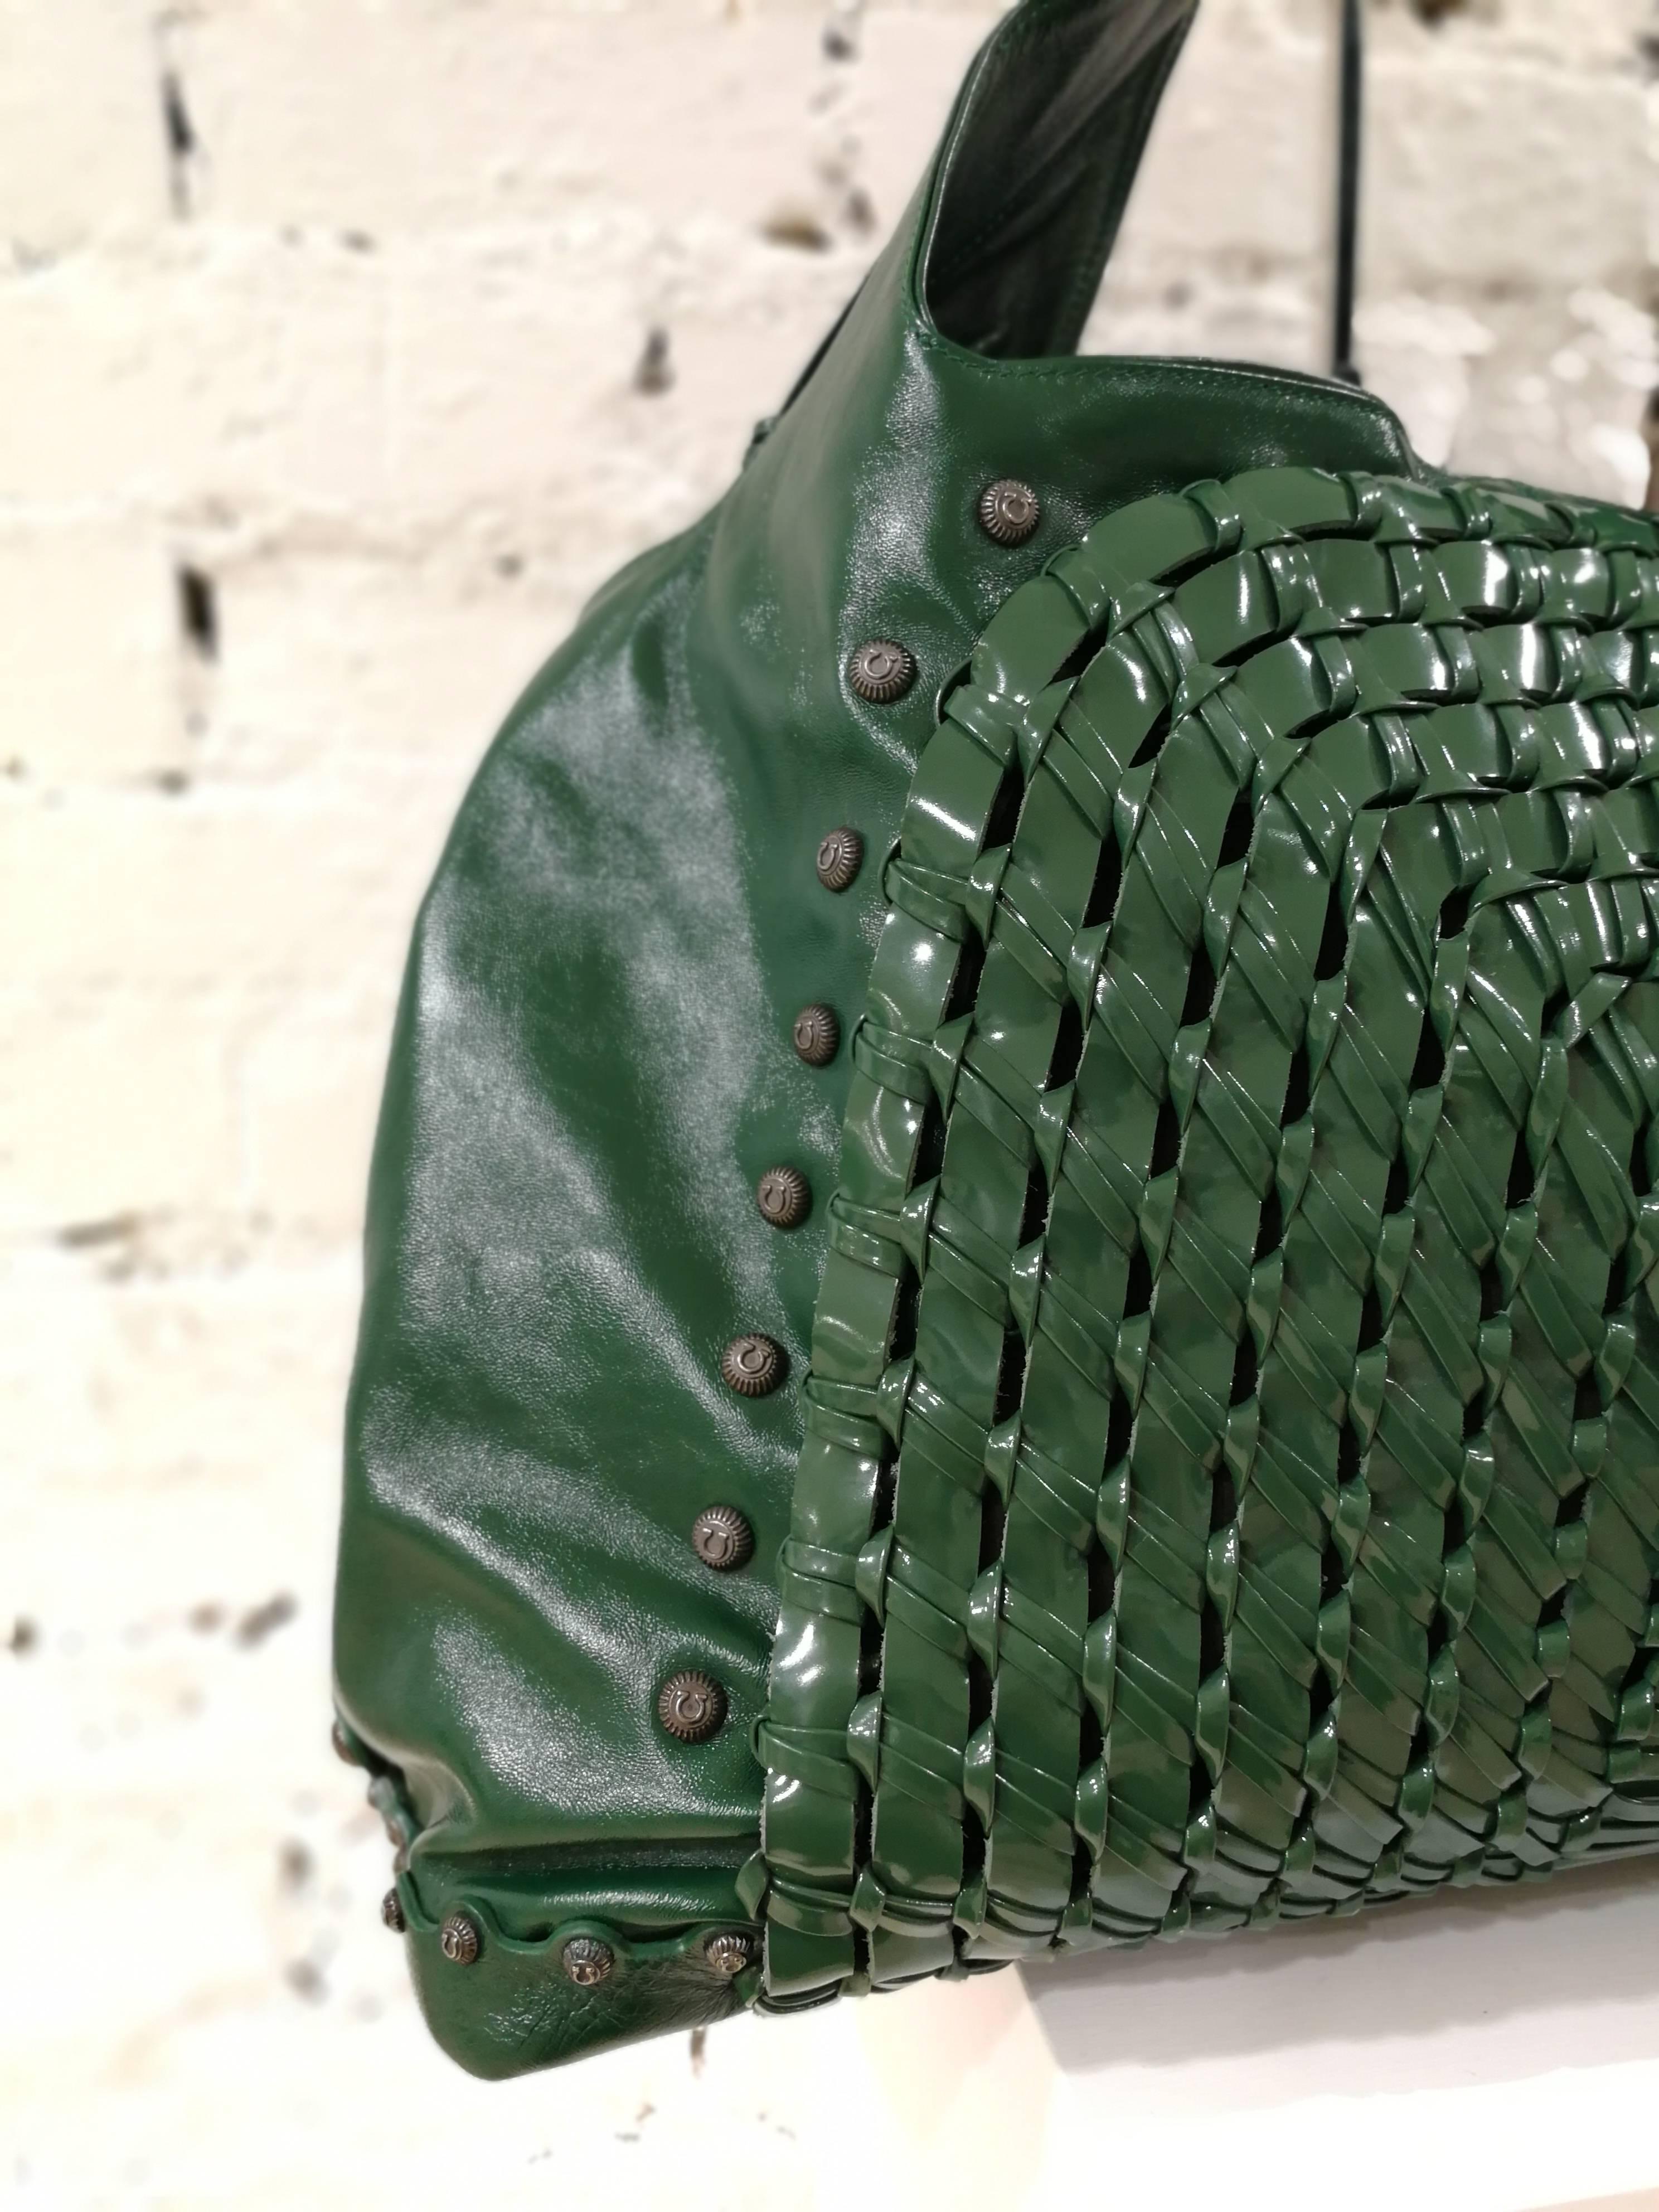 Salvatore Ferragamo Green Patent Leather Edera Hobo Shoulder Bag 4X2f01